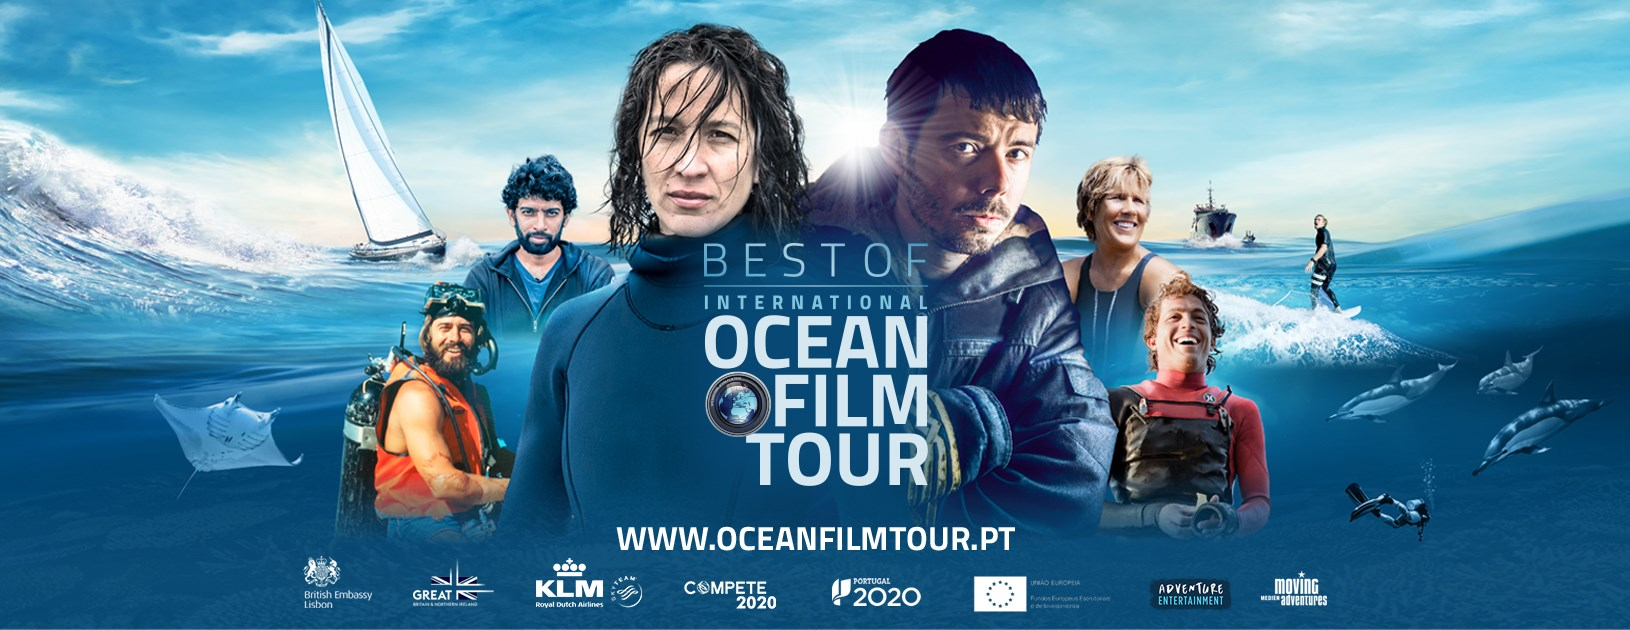 International Ocean Film Tour Best of - Ponta Delgada